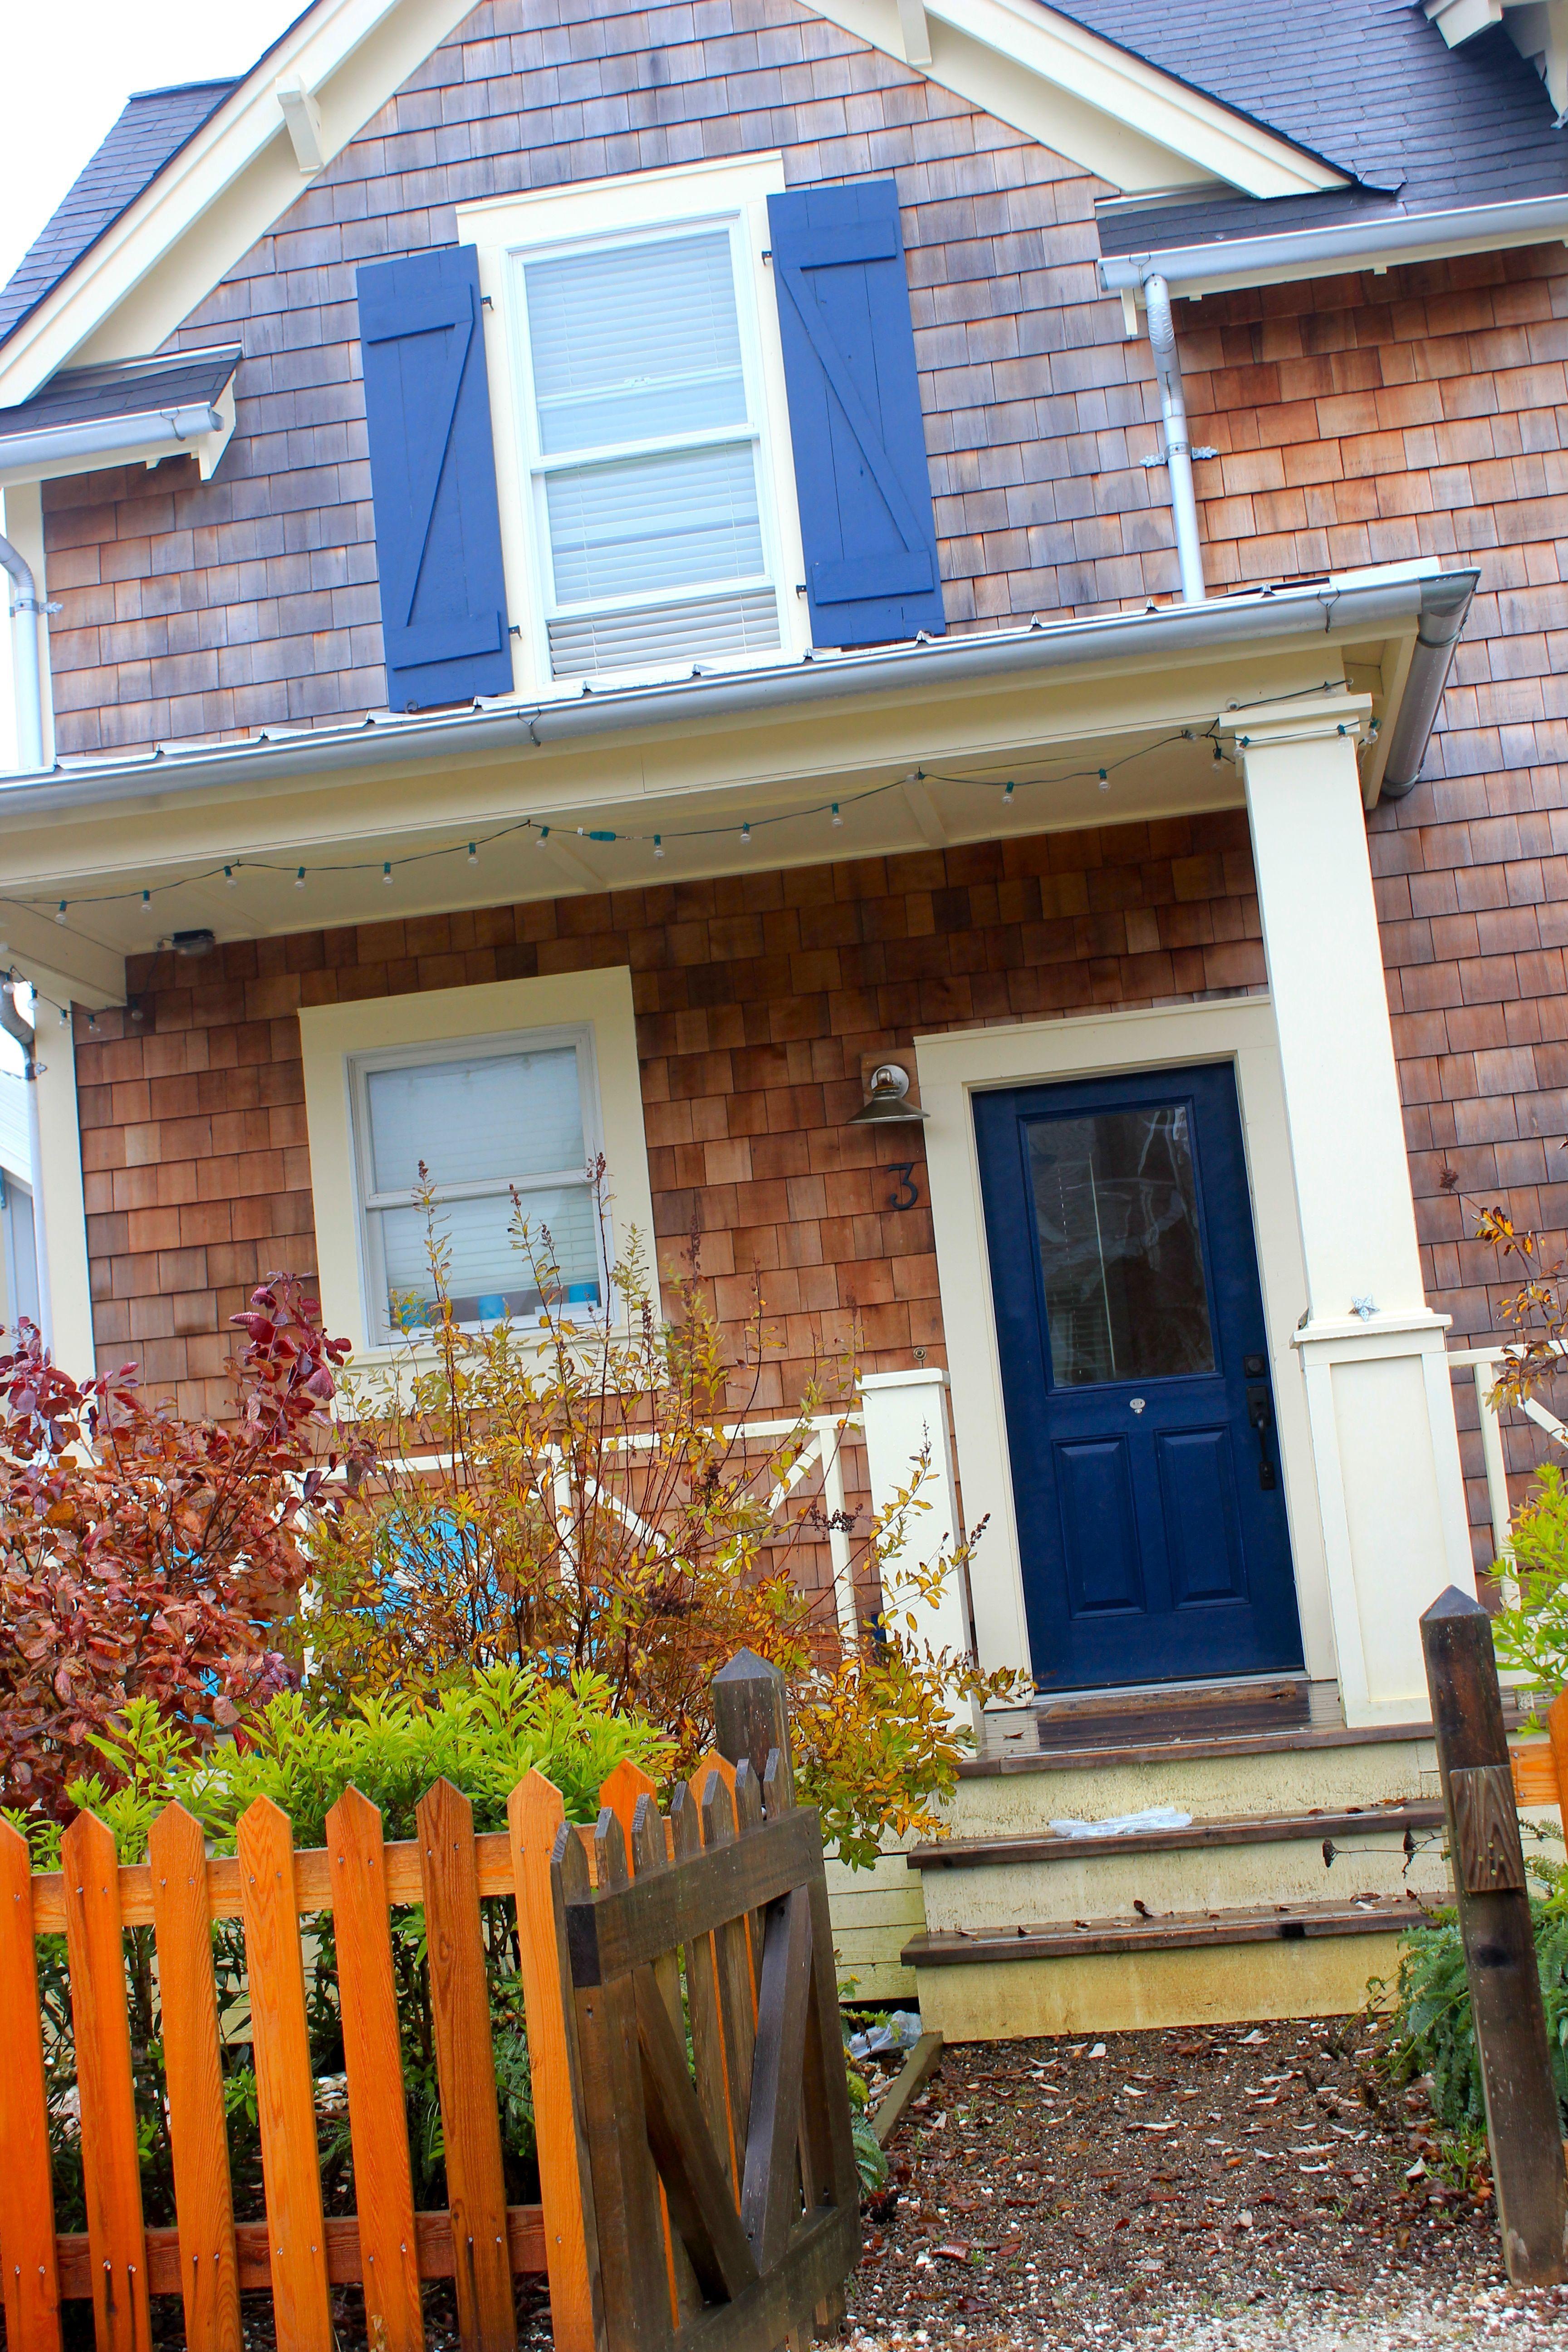 Best Cute Porch Light Brown Shingle Siding Navy Blue 400 x 300